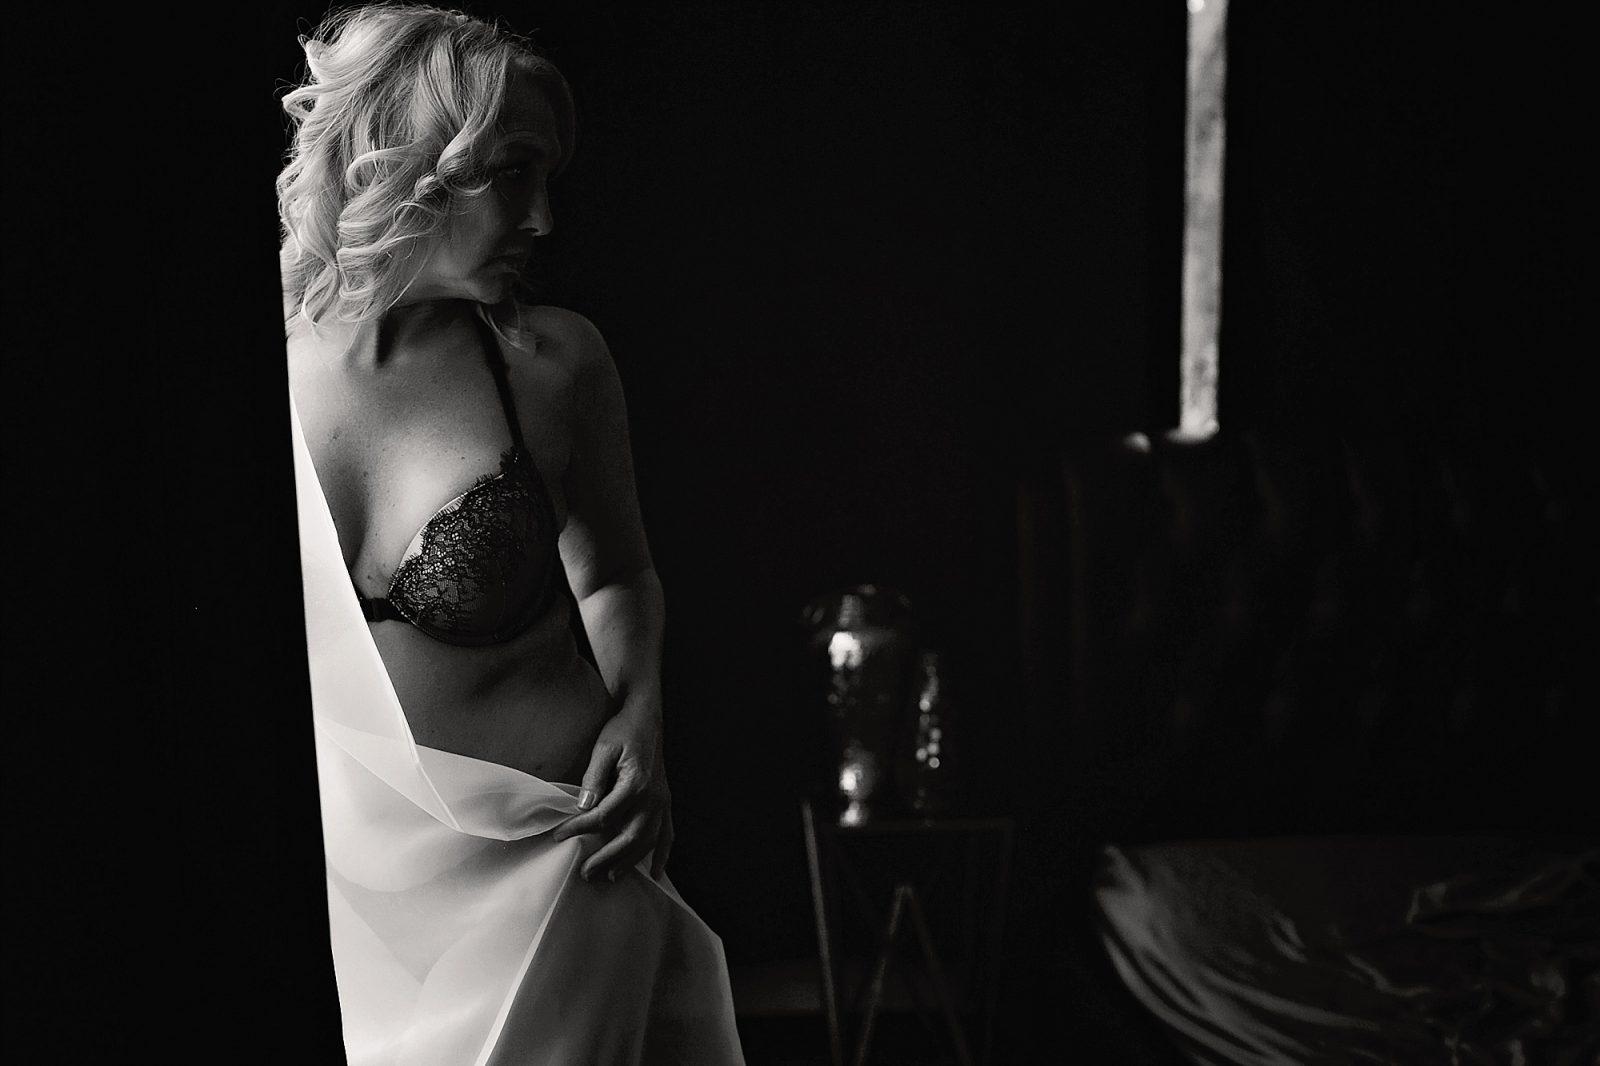 oakland california boudoir photographer